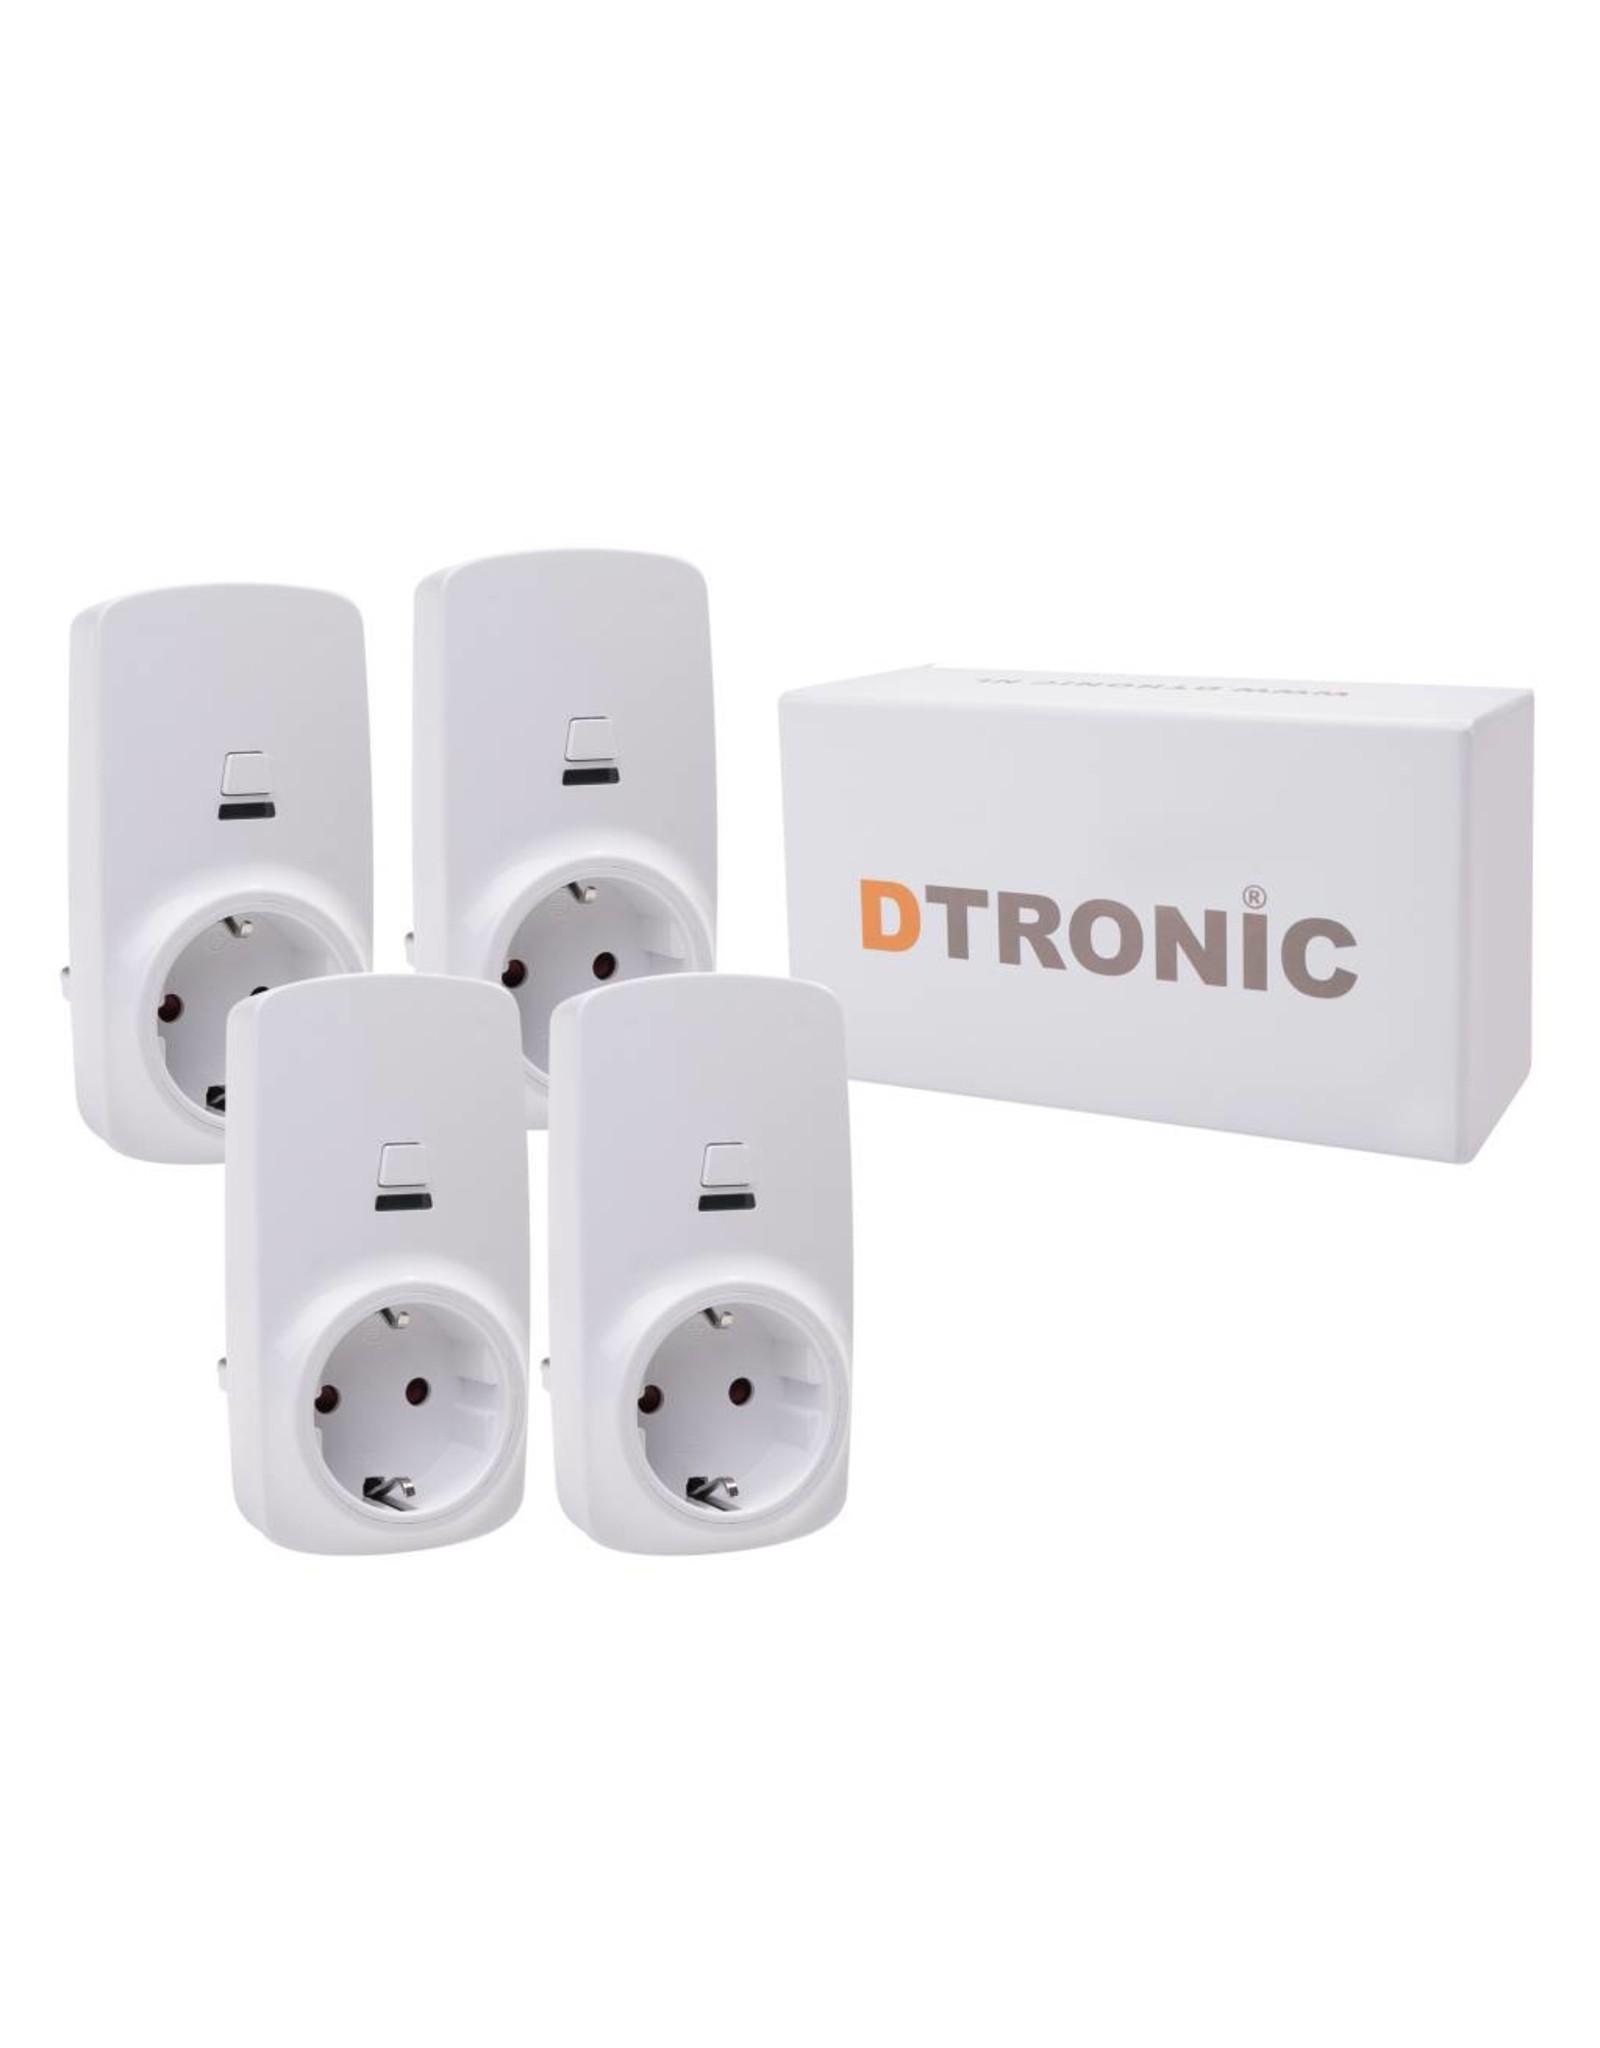 DTRONIC DTRONIC - WLSC01 - 4st.